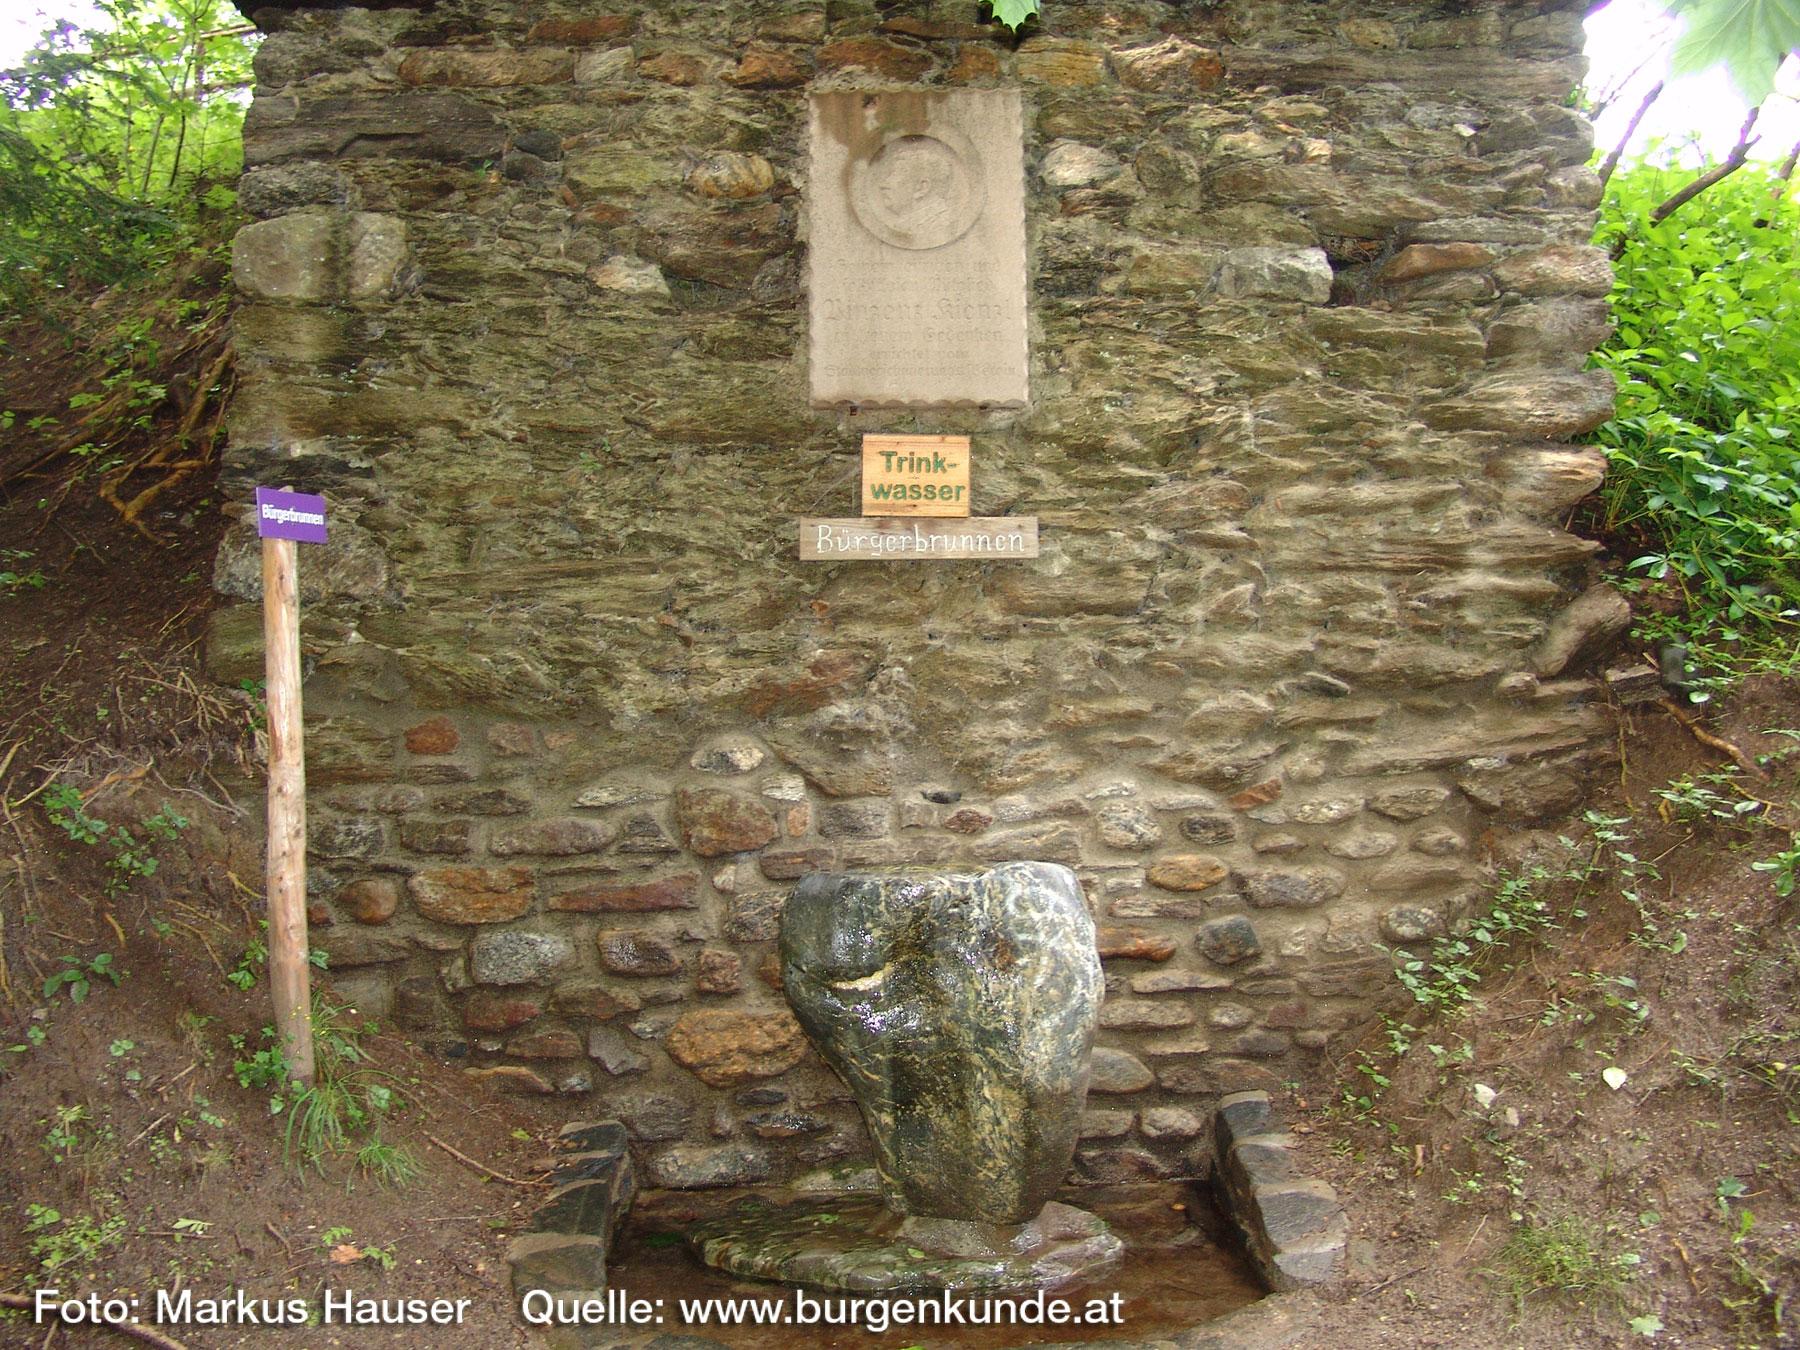 Burgruine-Gomarn-Bad-St-Leonhard-Kaernten-035